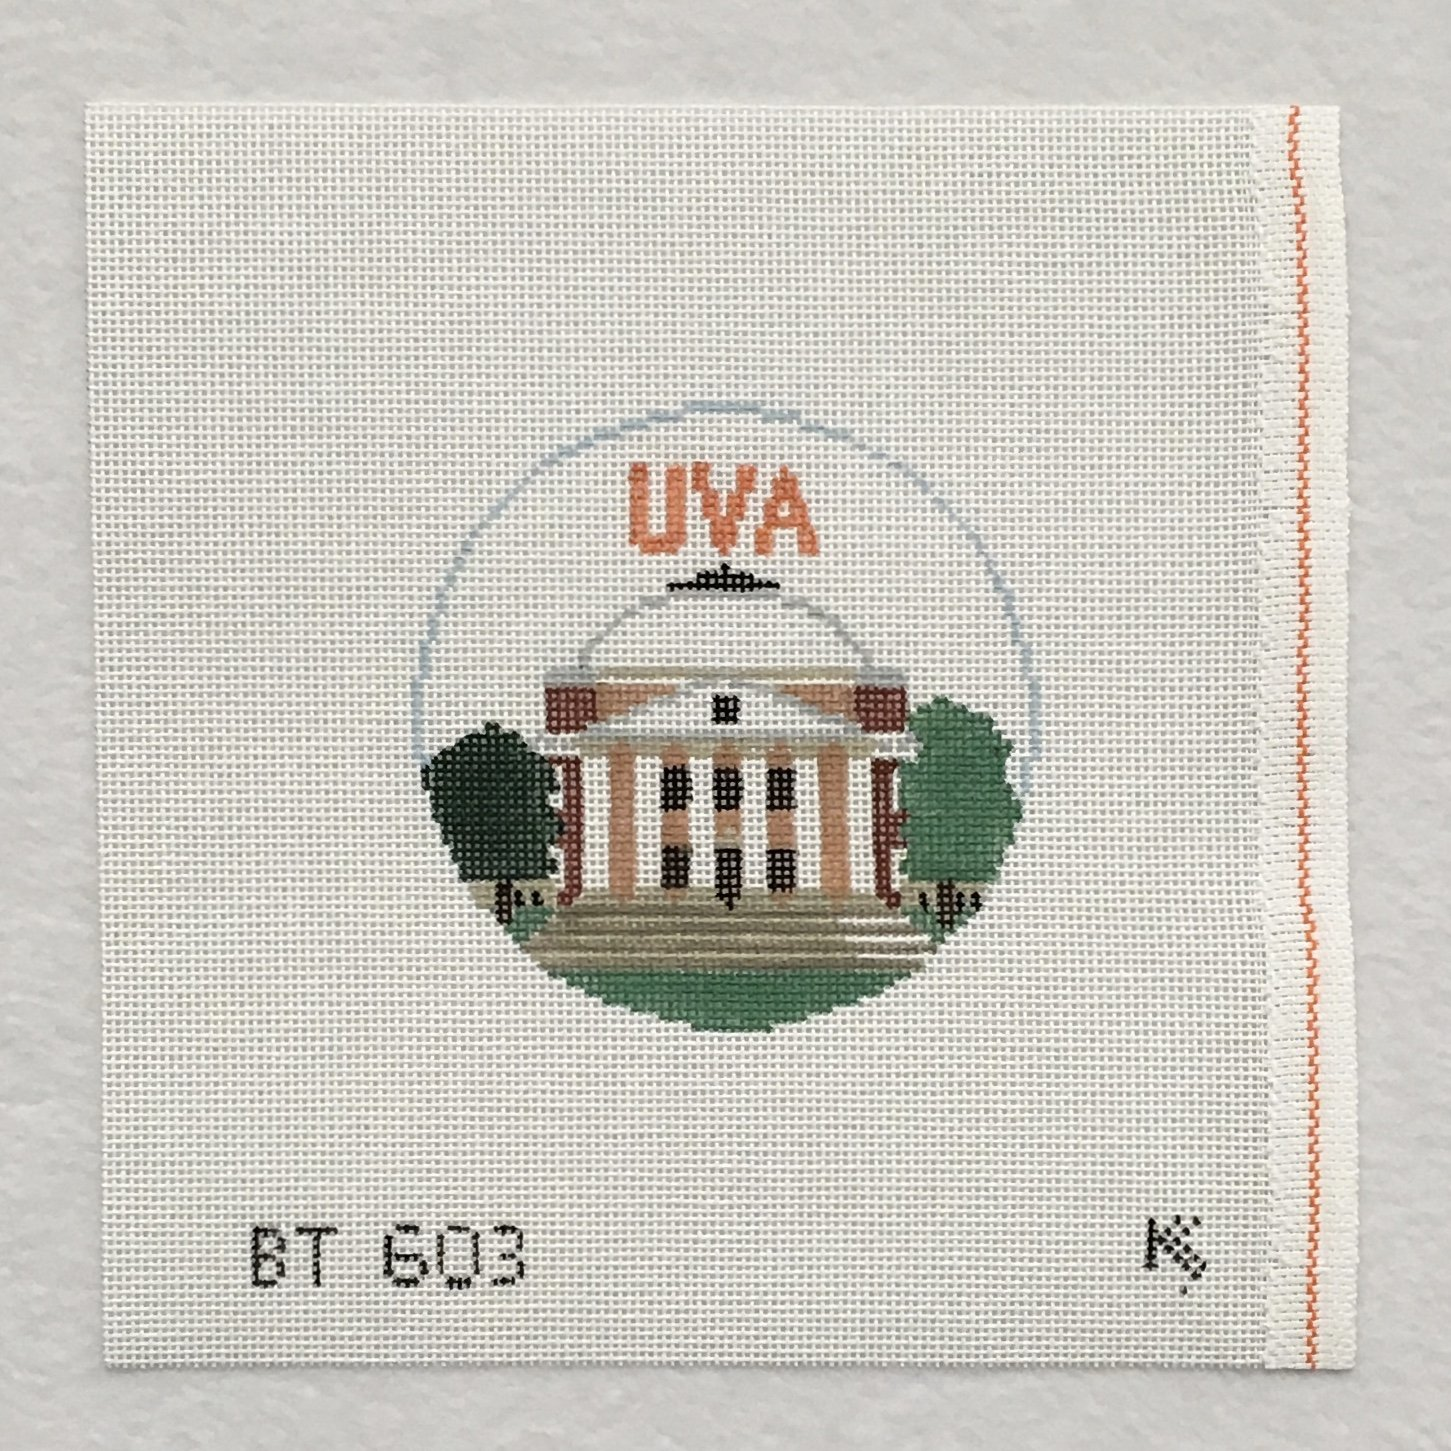 BT603 Univ of Virginia Rotunda Round